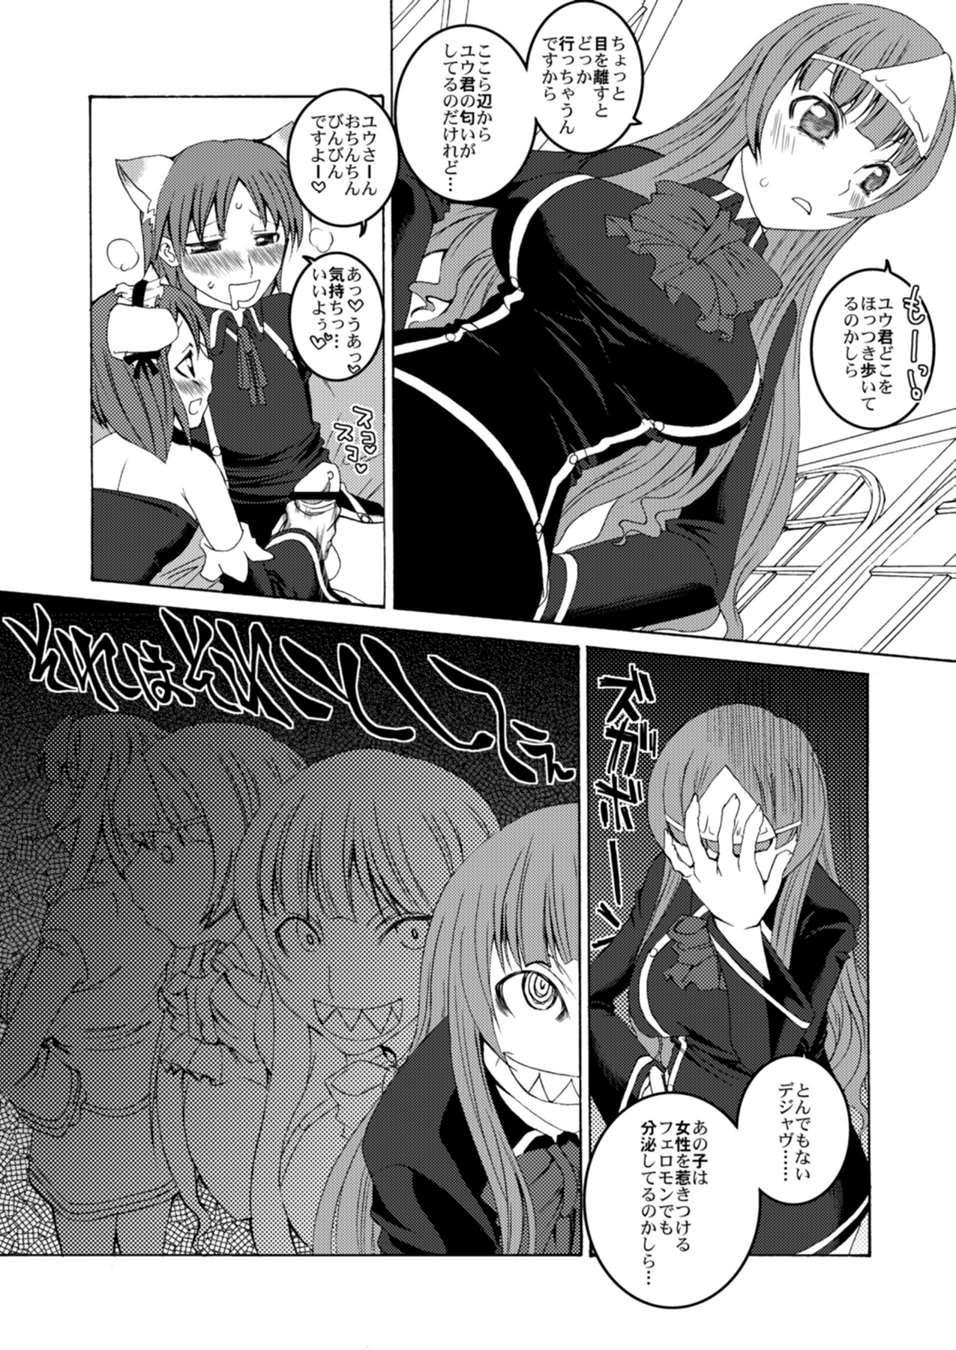 U-REI GIRL SENTIMENTAL FIGHT 4